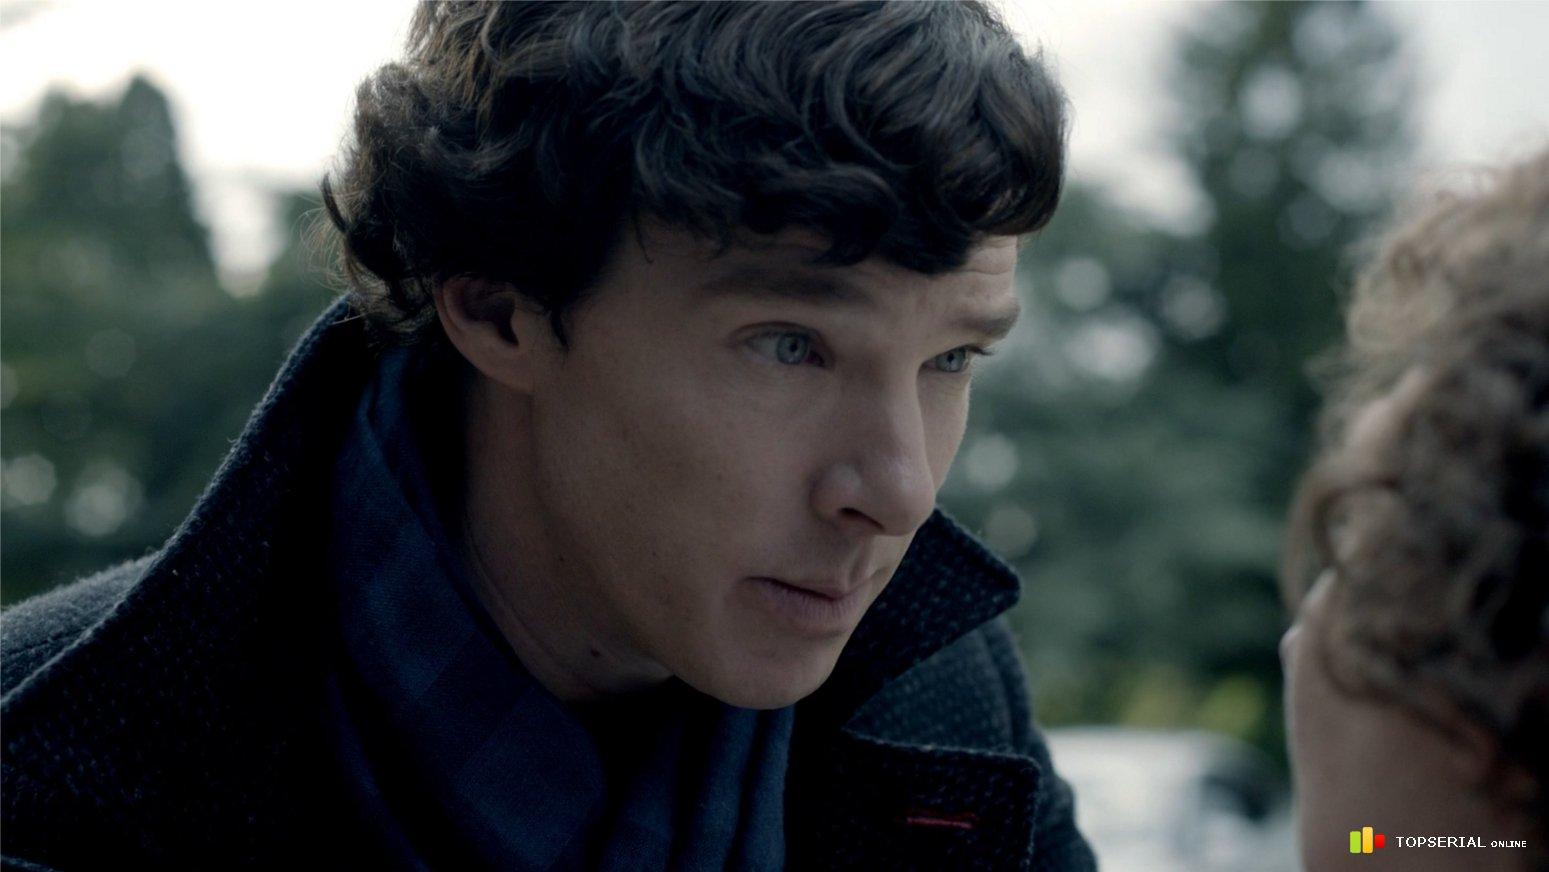 Шерлок Холмс Игра теней 2011 смотреть онлайн в HD 1080